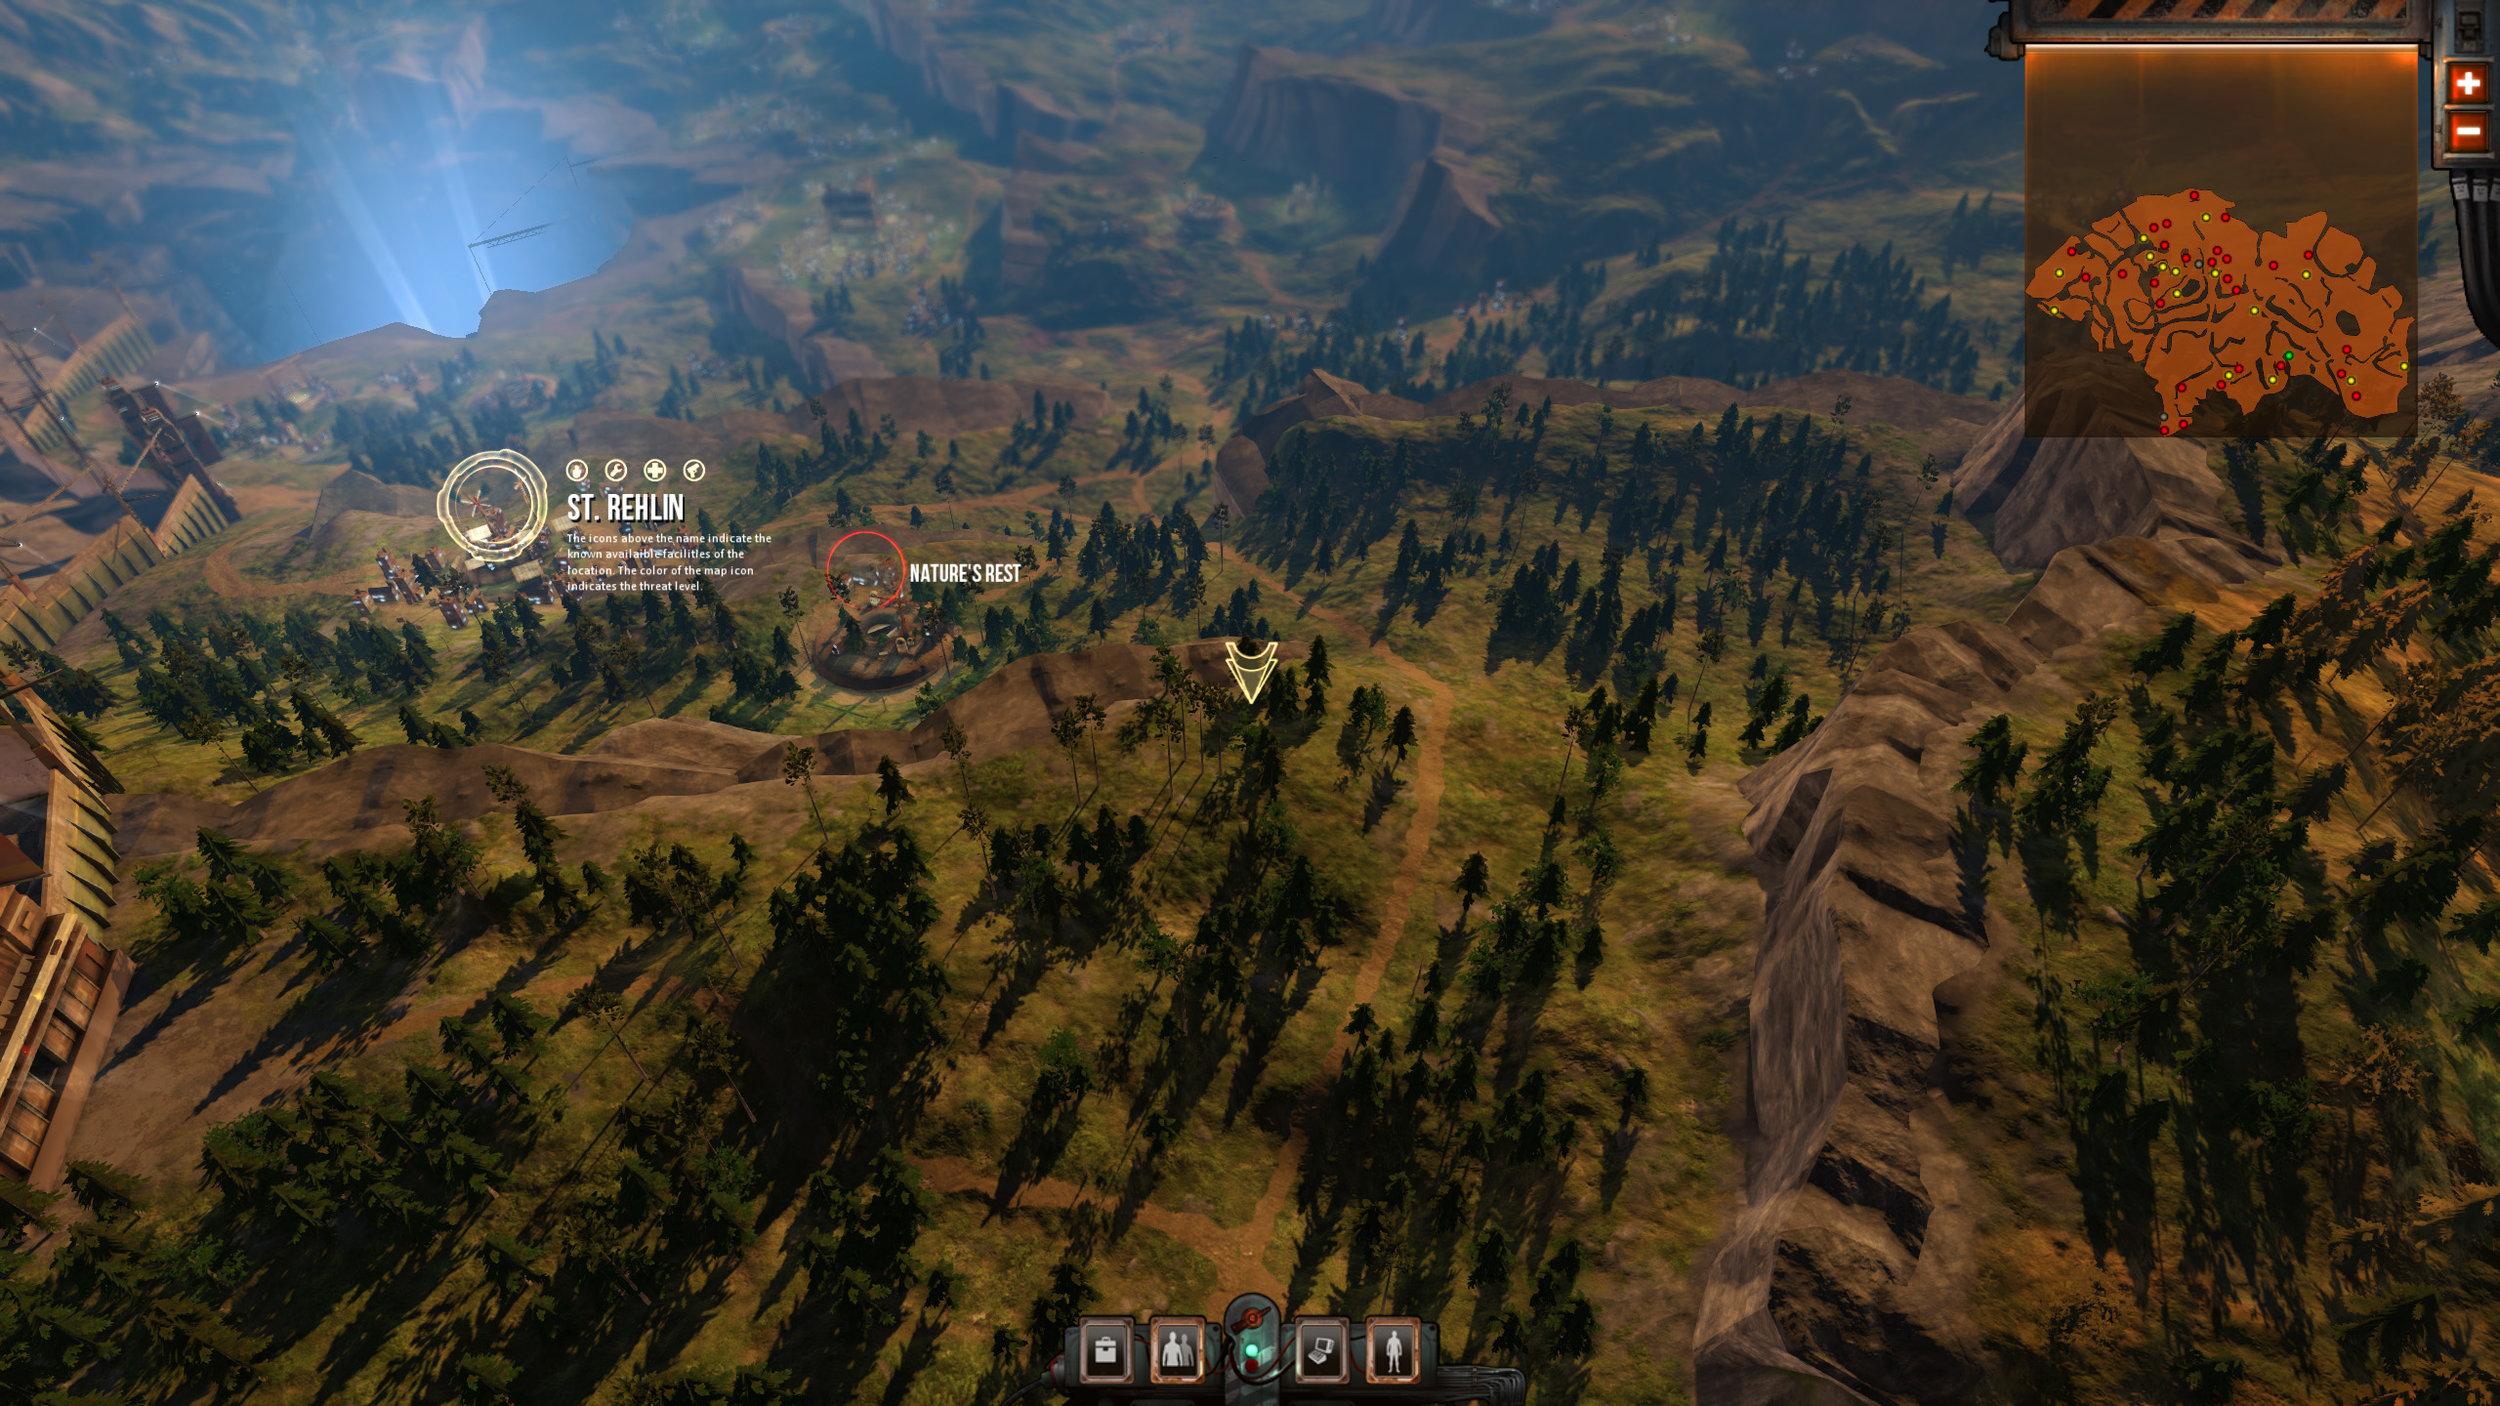 Krater Shadows over Solside Screenshot 15.jpg